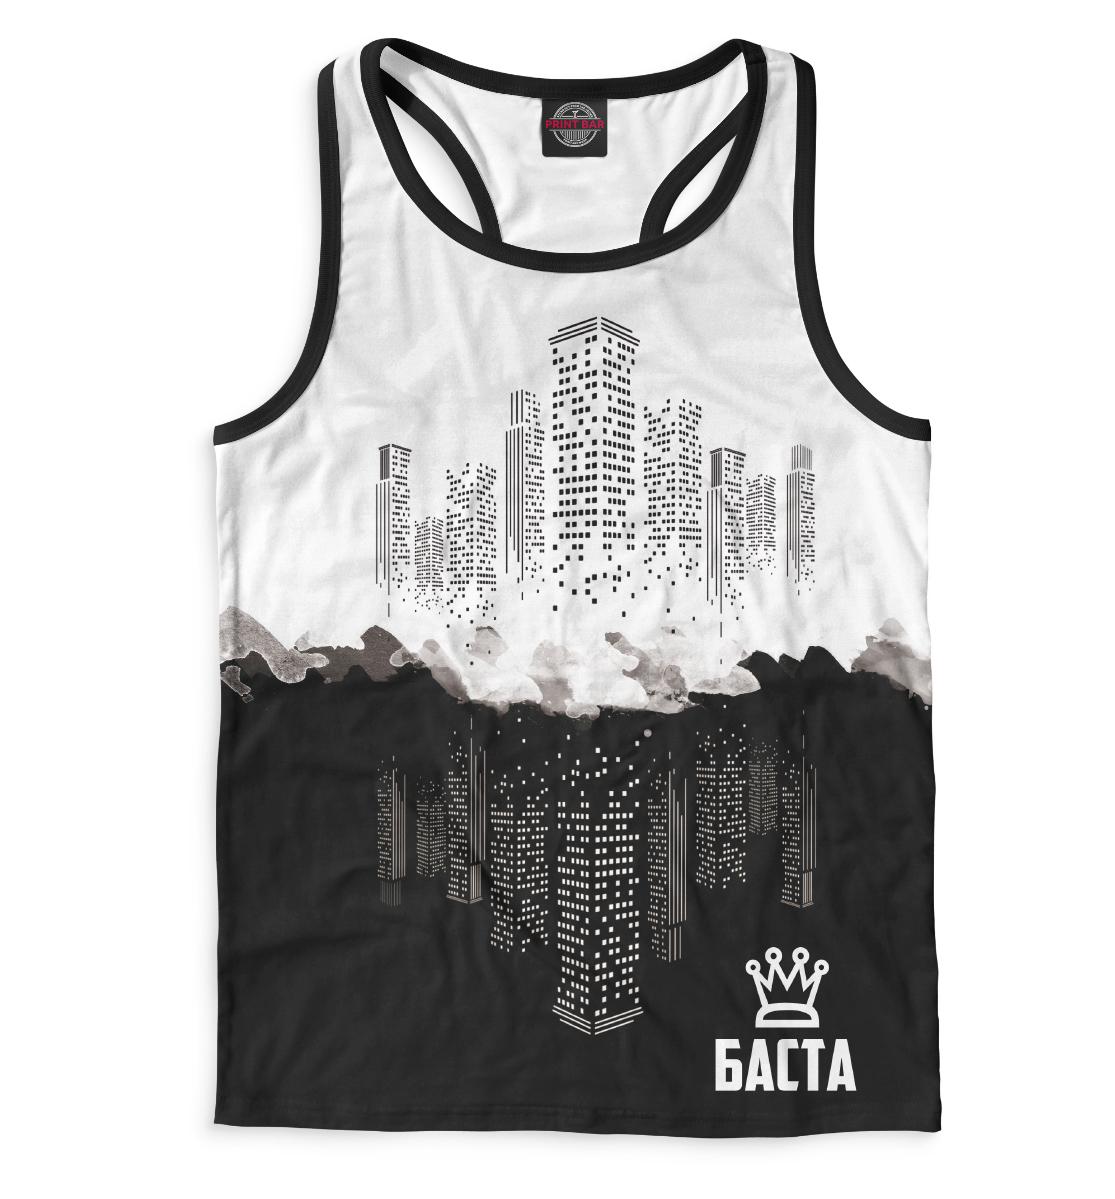 Купить Баста, Printbar, Майки борцовки, BST-926159-mayb-2